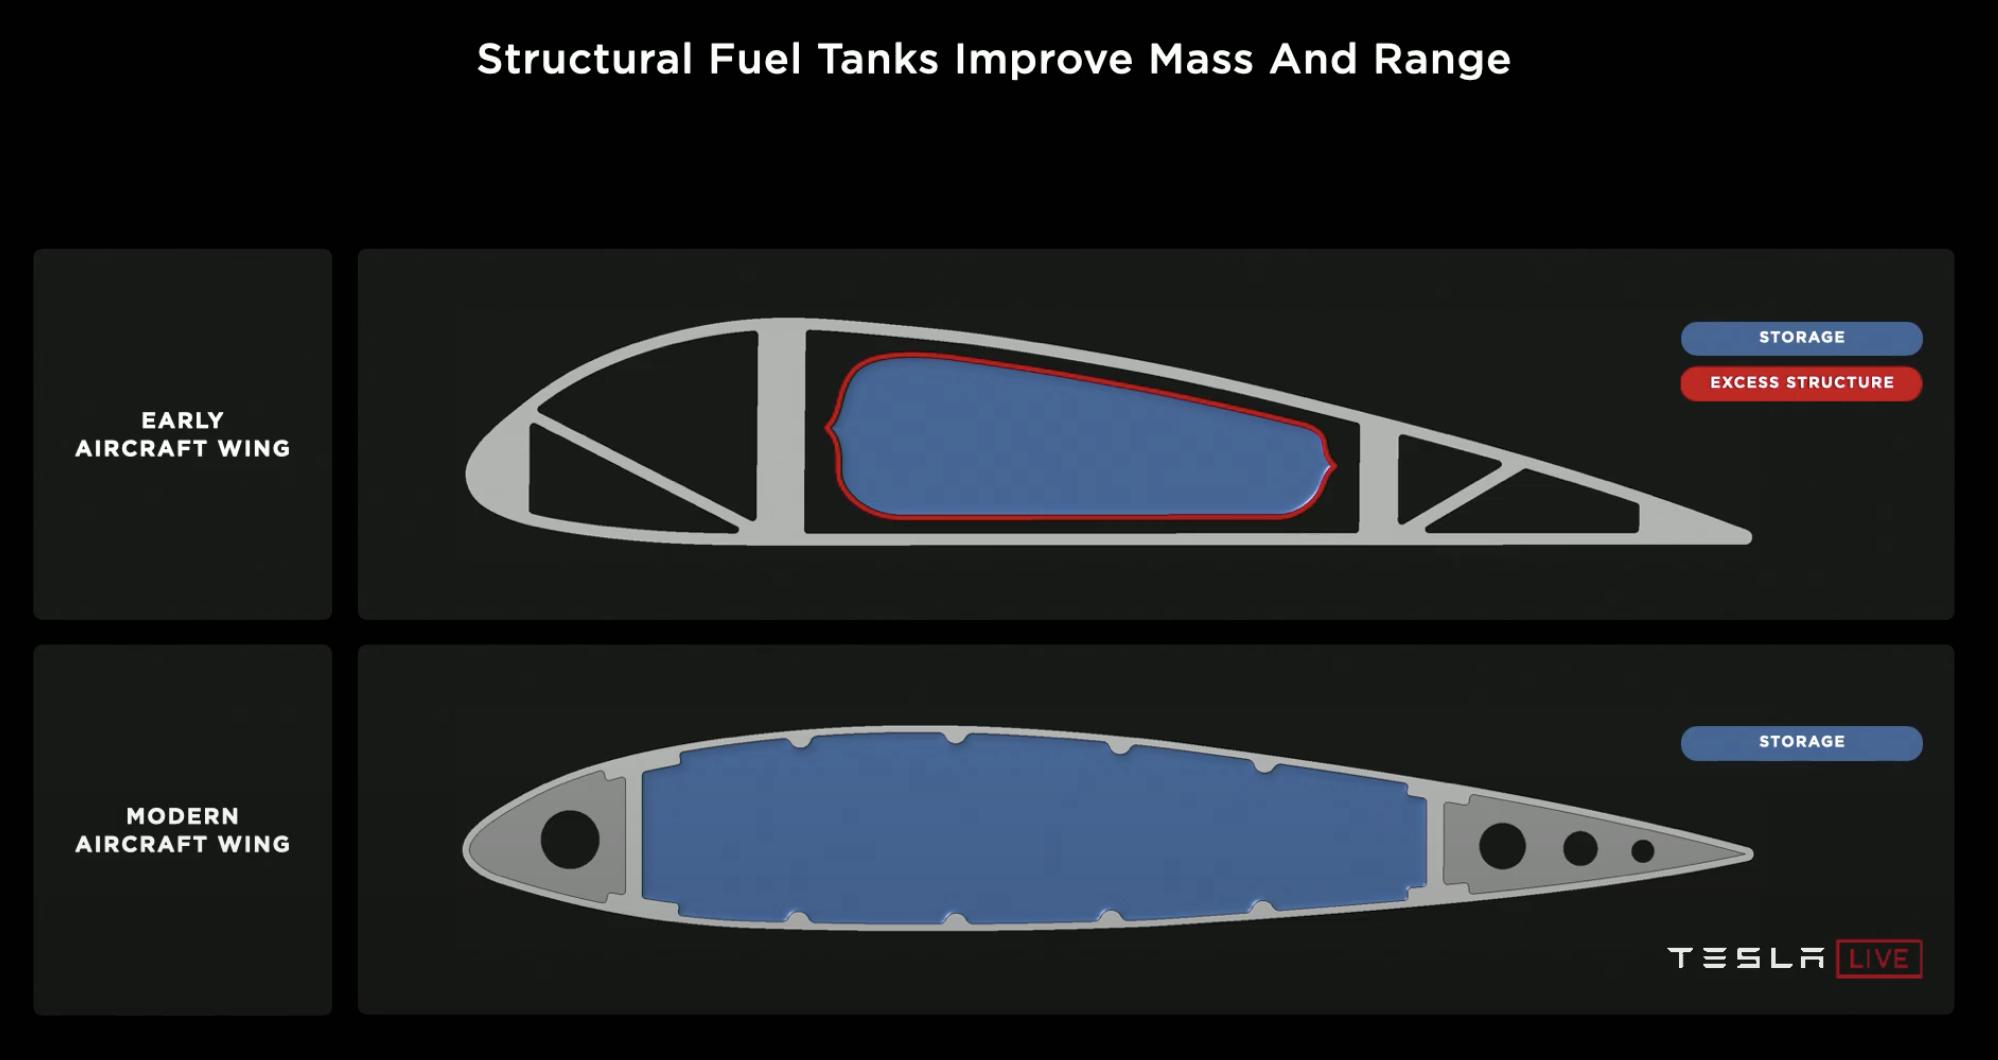 tesla-aircraft-fuel-tanks-battery-design